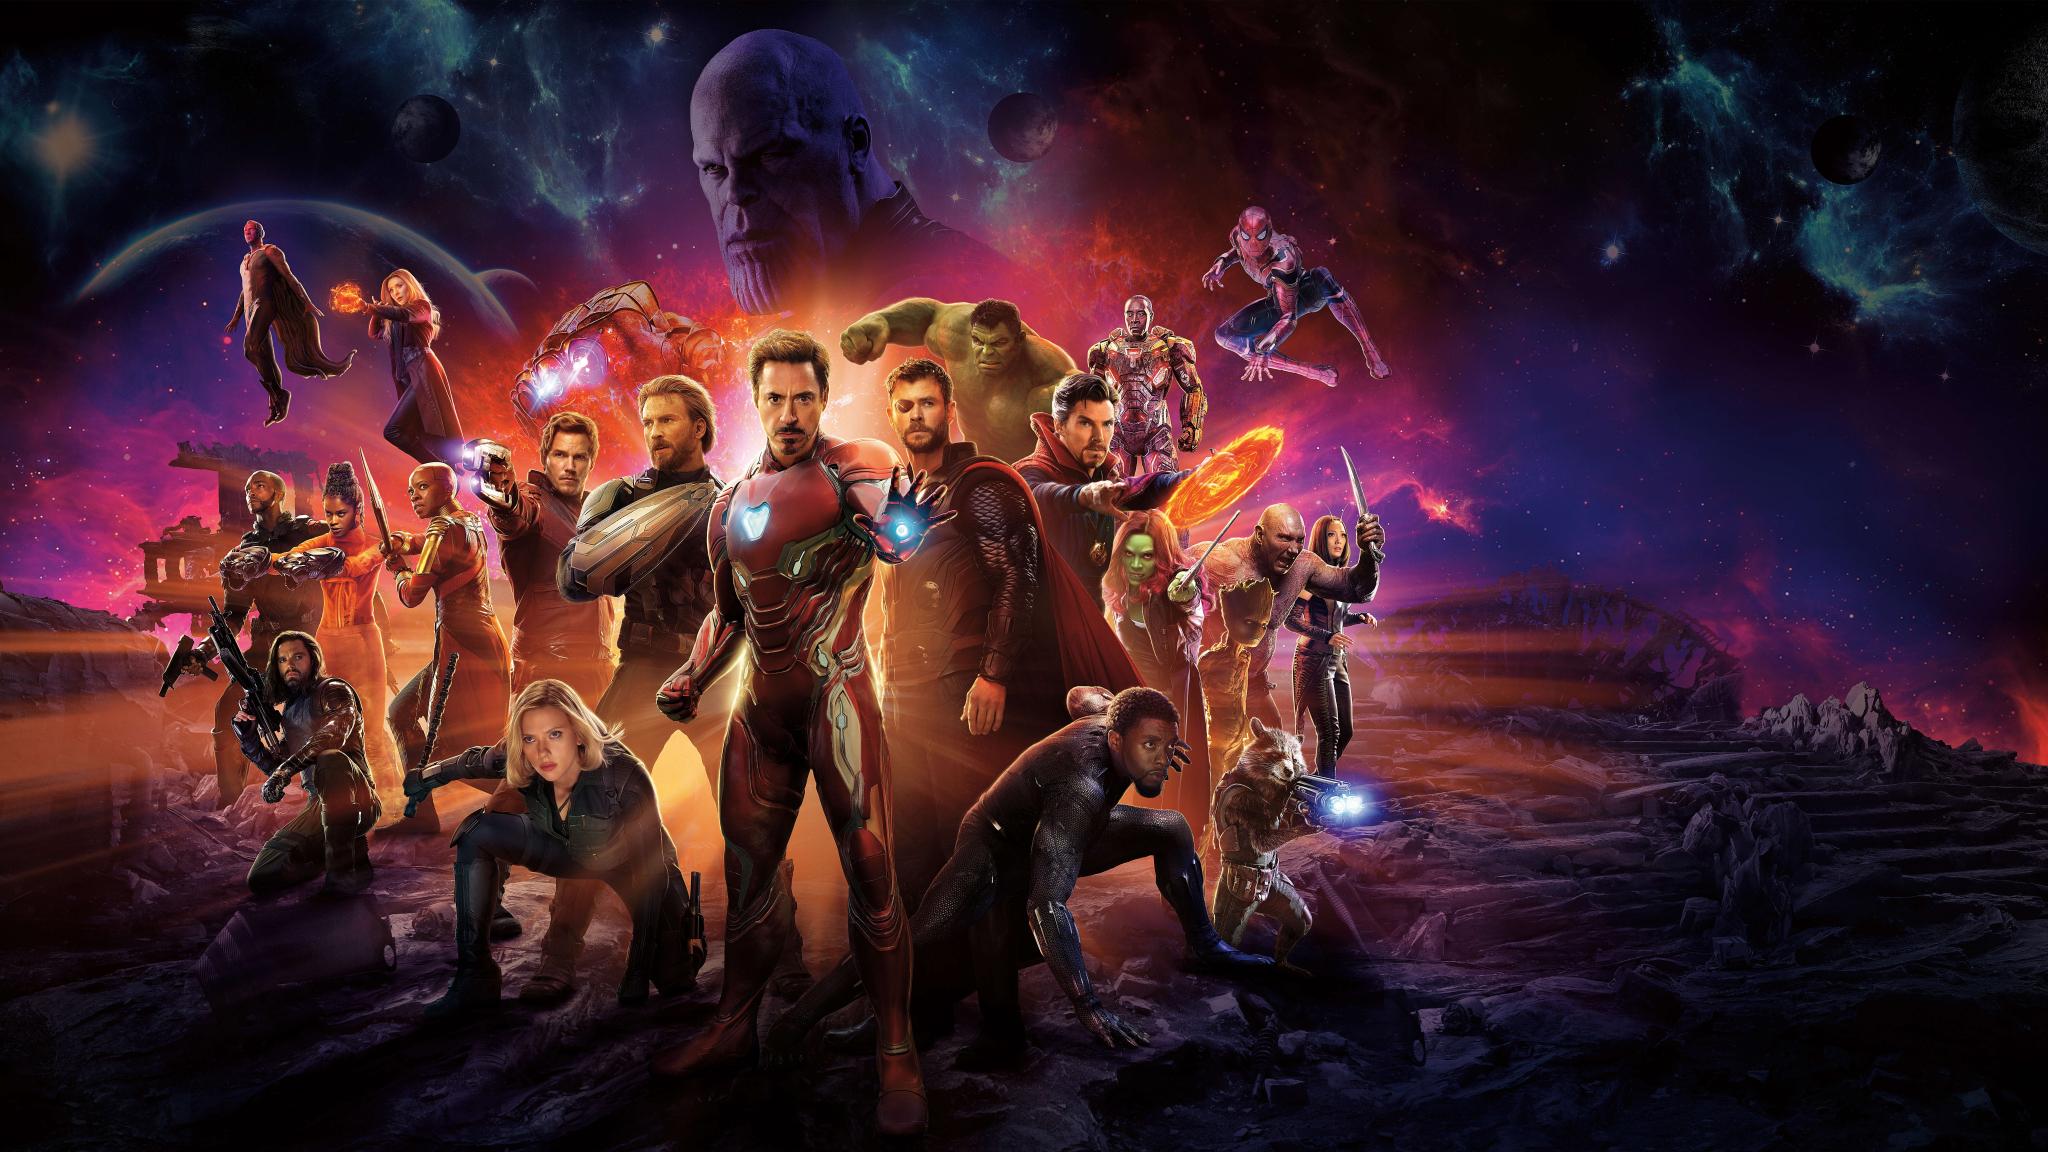 Movie Poster 2019: Avengers Infinity War International Poster, HD 10K Wallpaper